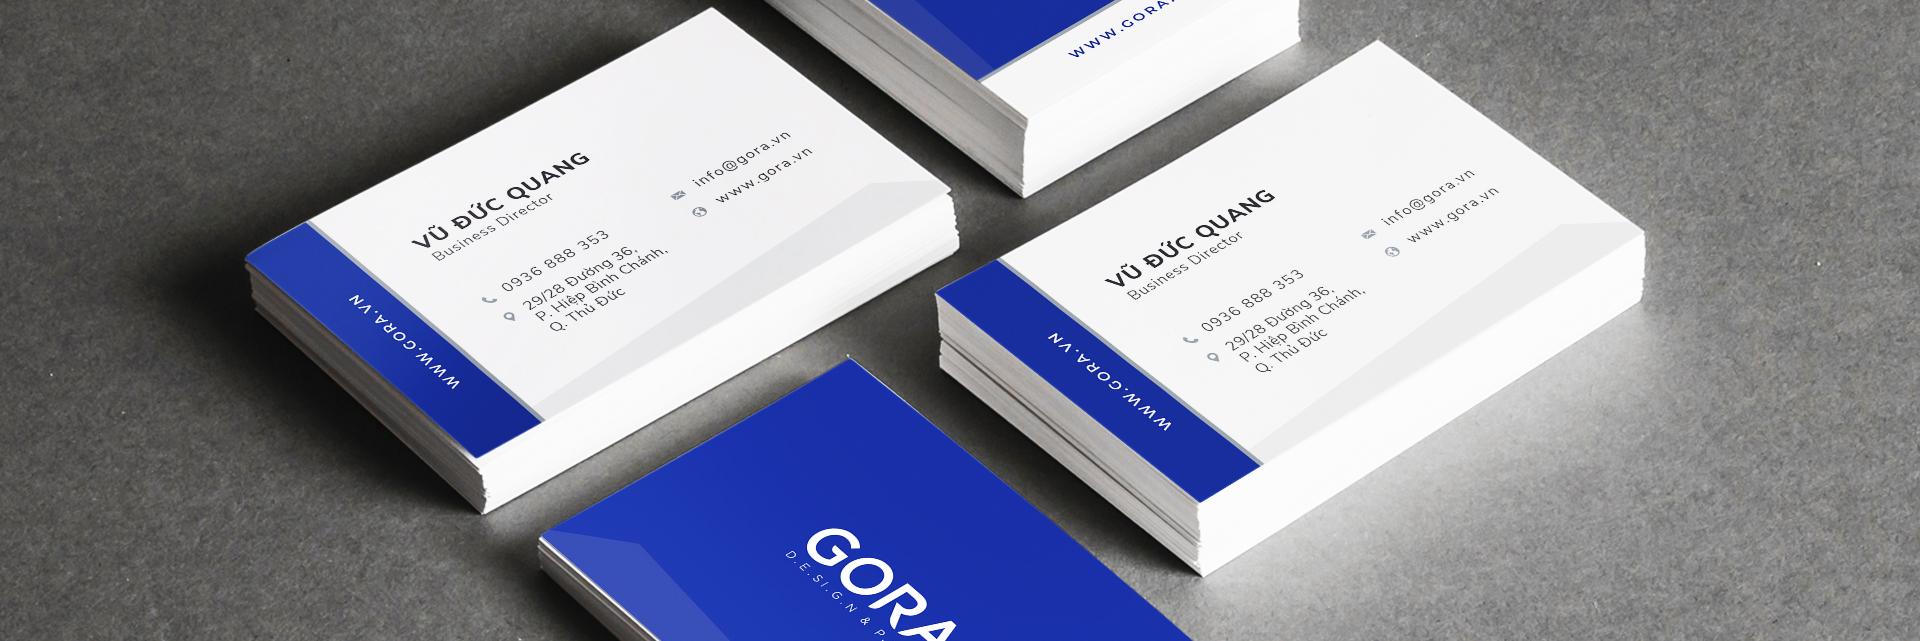 BlueColor_Namecard_Slide_03